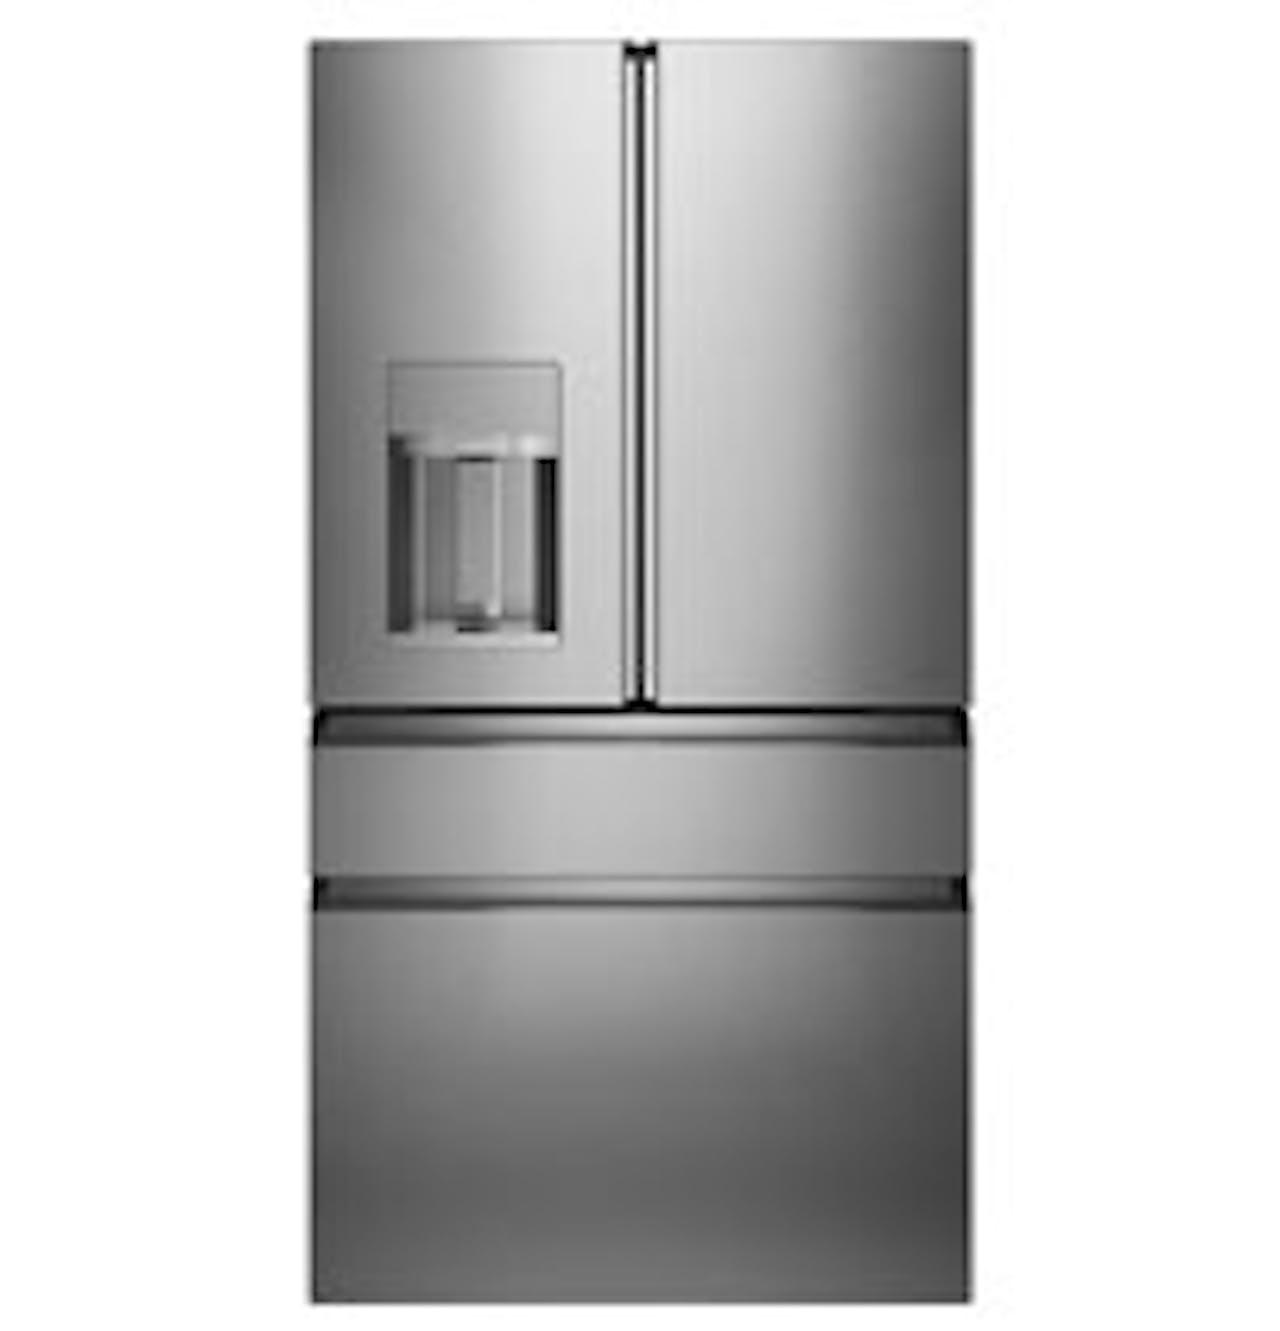 Full size refrigerators